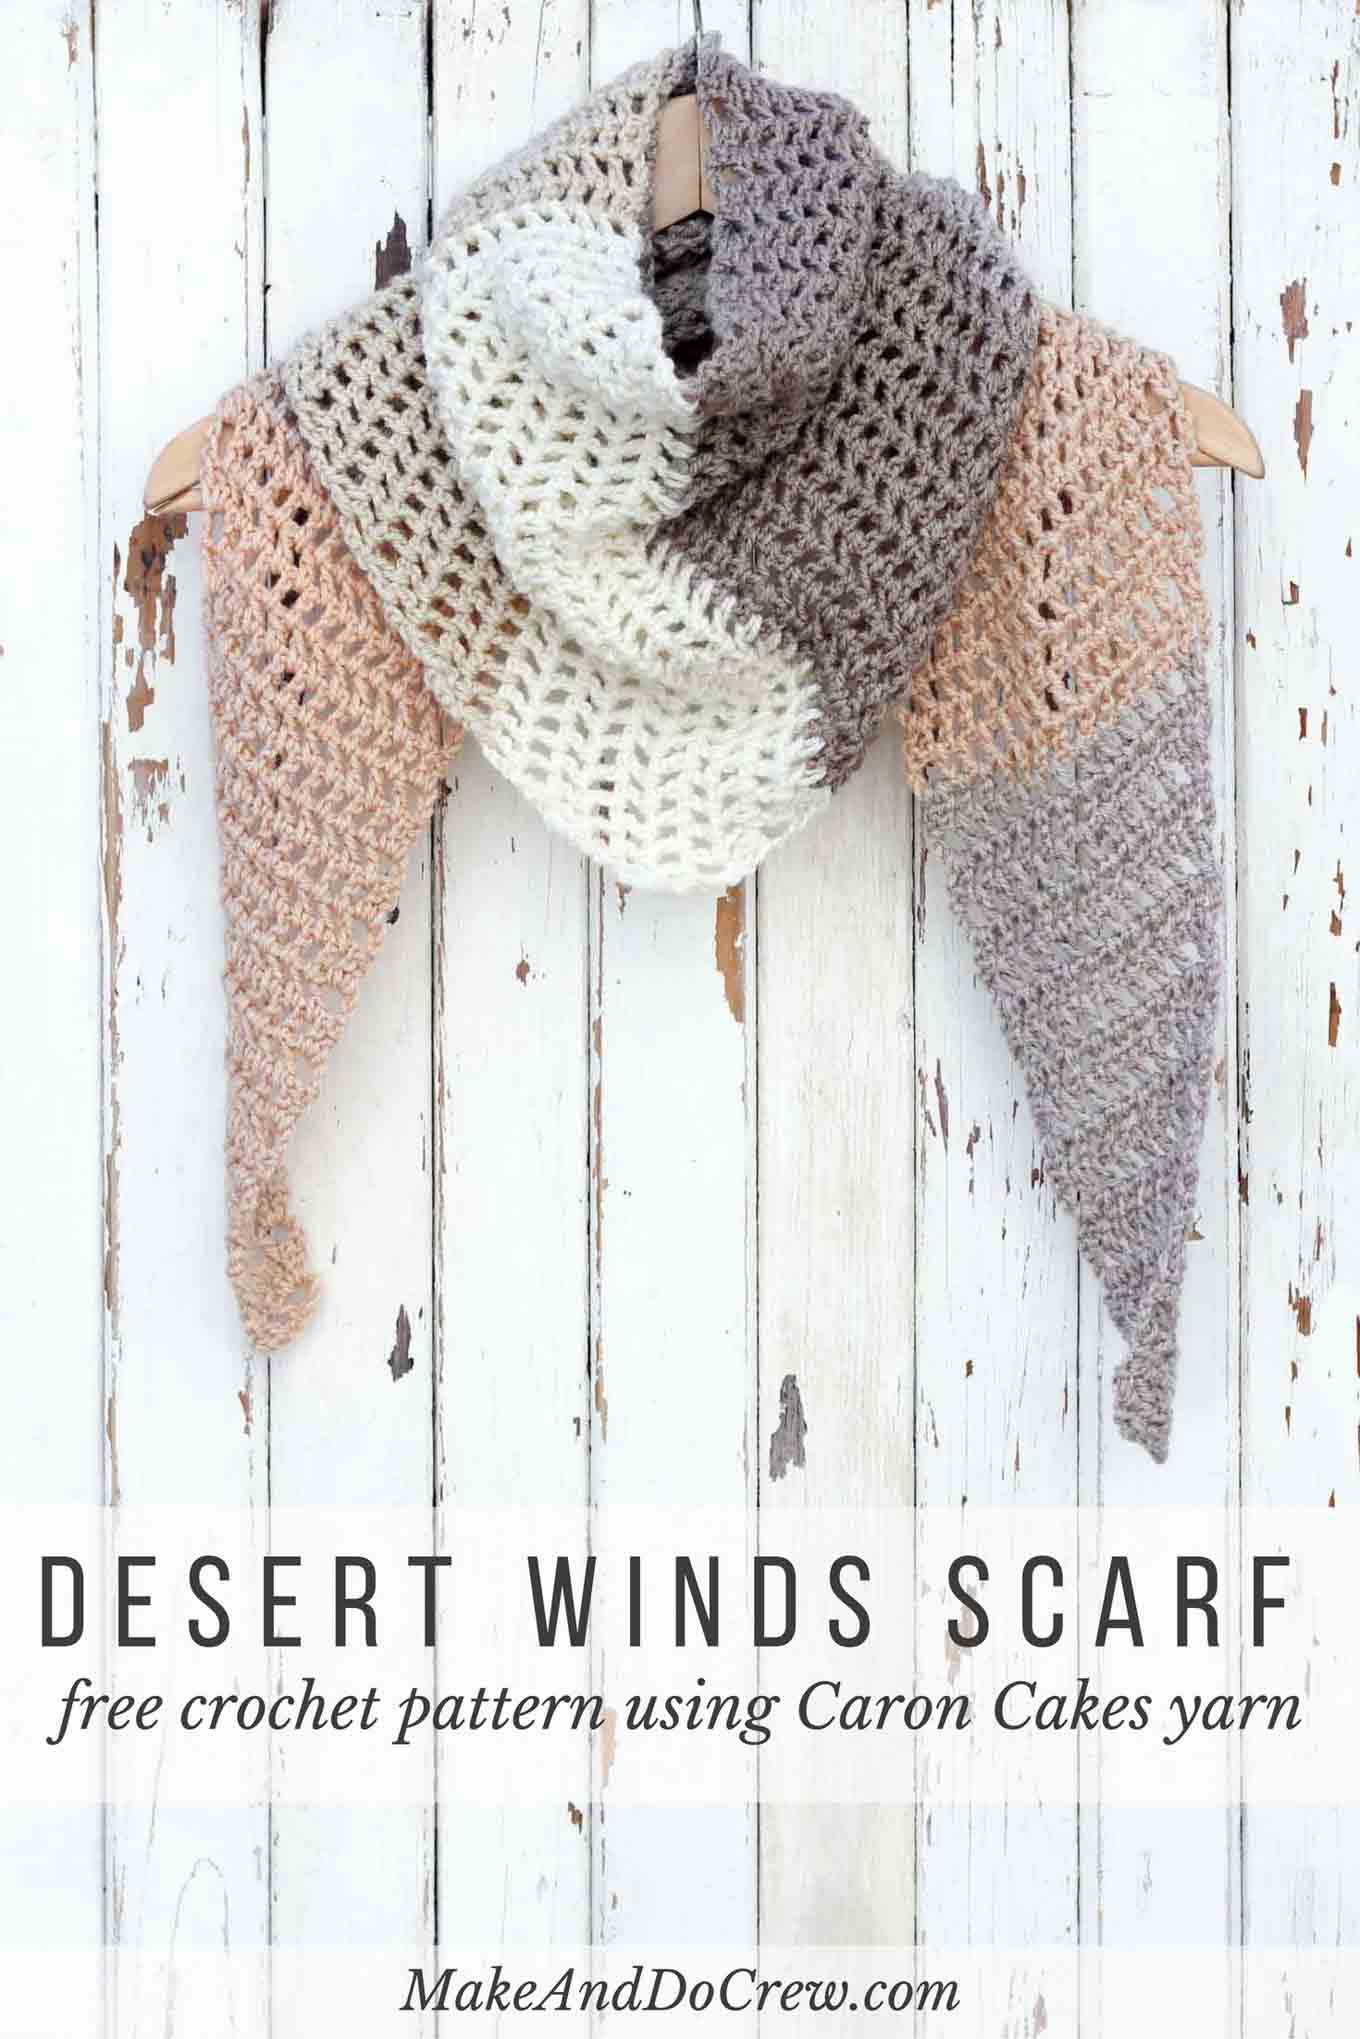 Free Caron Cakes Crochet Pattern - Desert Winds Triangle Scarf - Free Printable Crochet Scarf Patterns